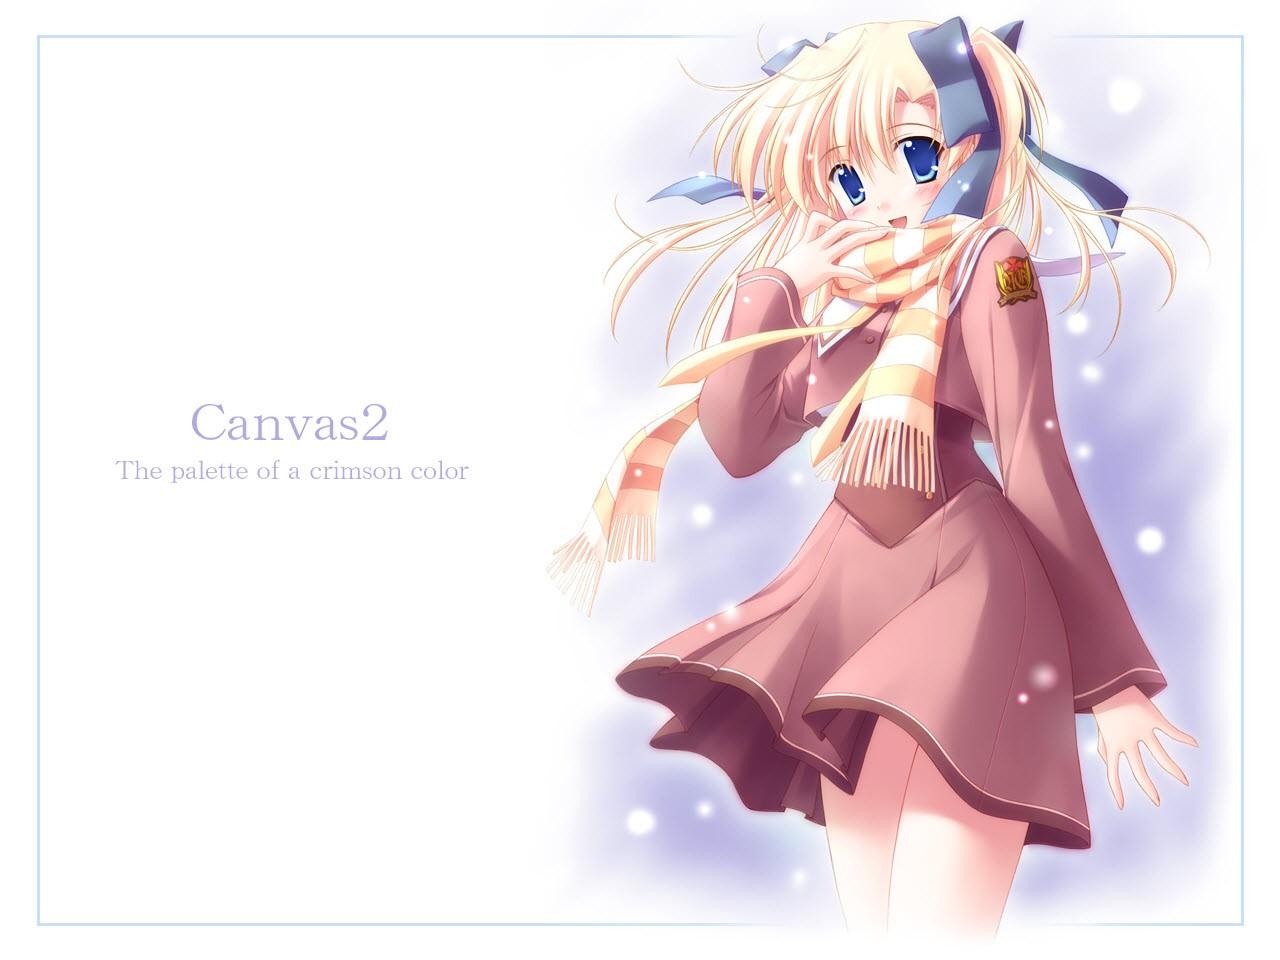 Cute Girl Wallpaper Hd Full Anime Girl 181 Wallpapers Hd Wallpapers Id 7359